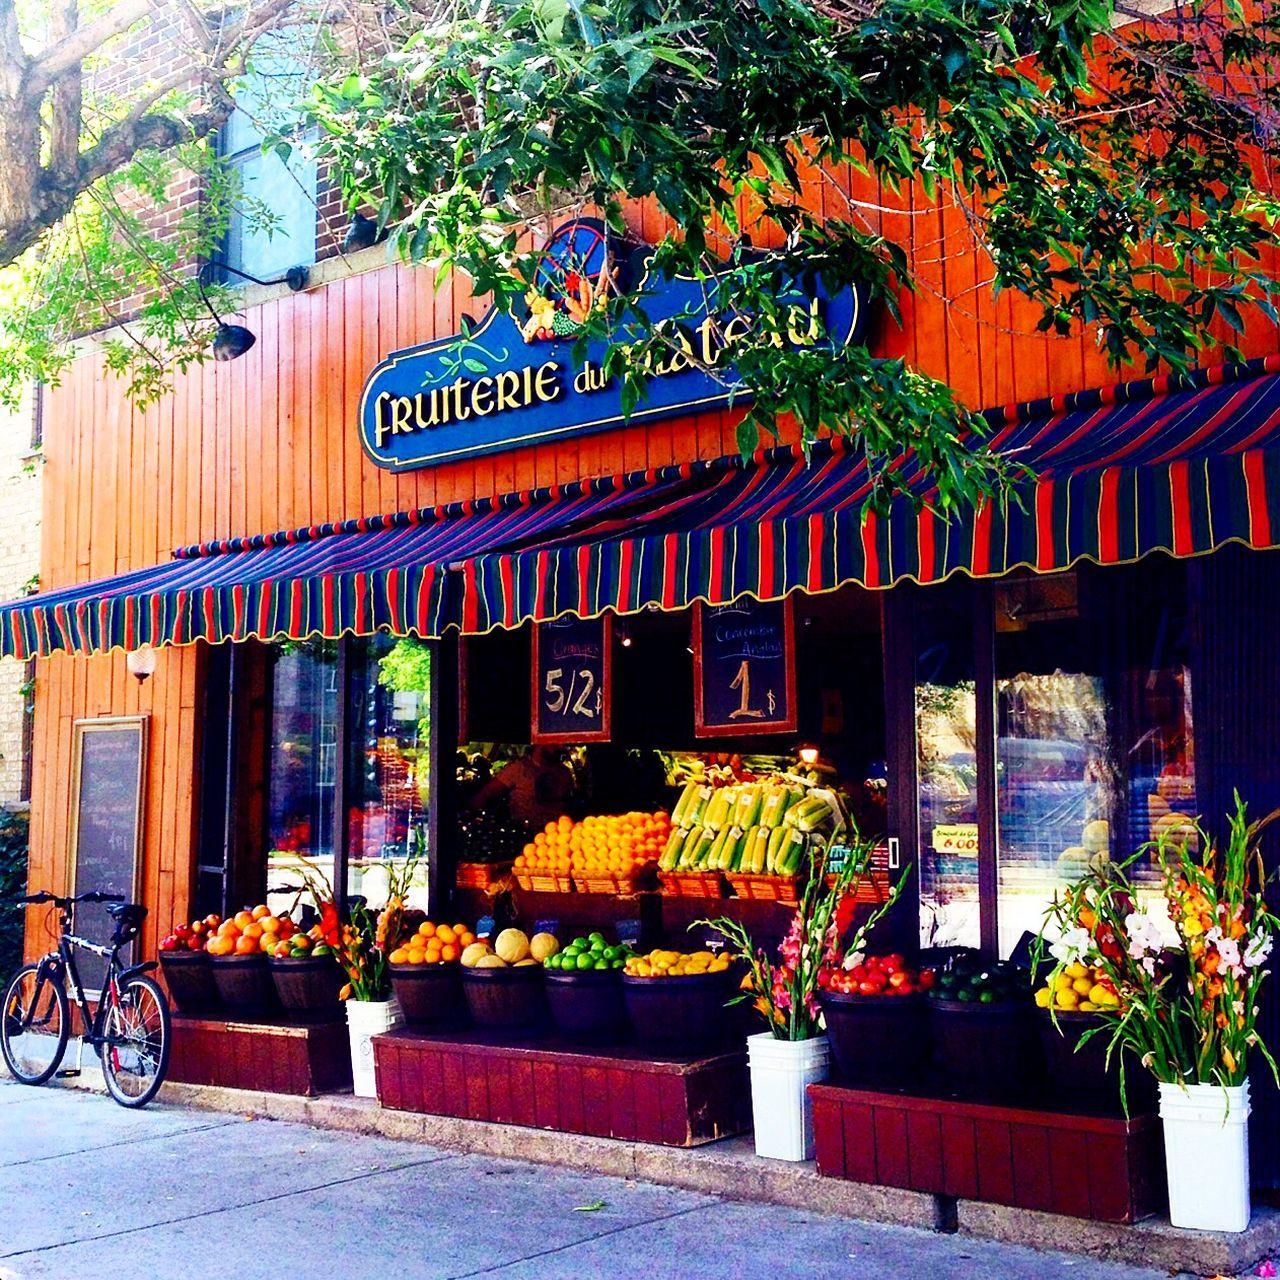 Montreal, Canada Fruterie Fruit Shop Beautiful Summer Sunny August Montréal